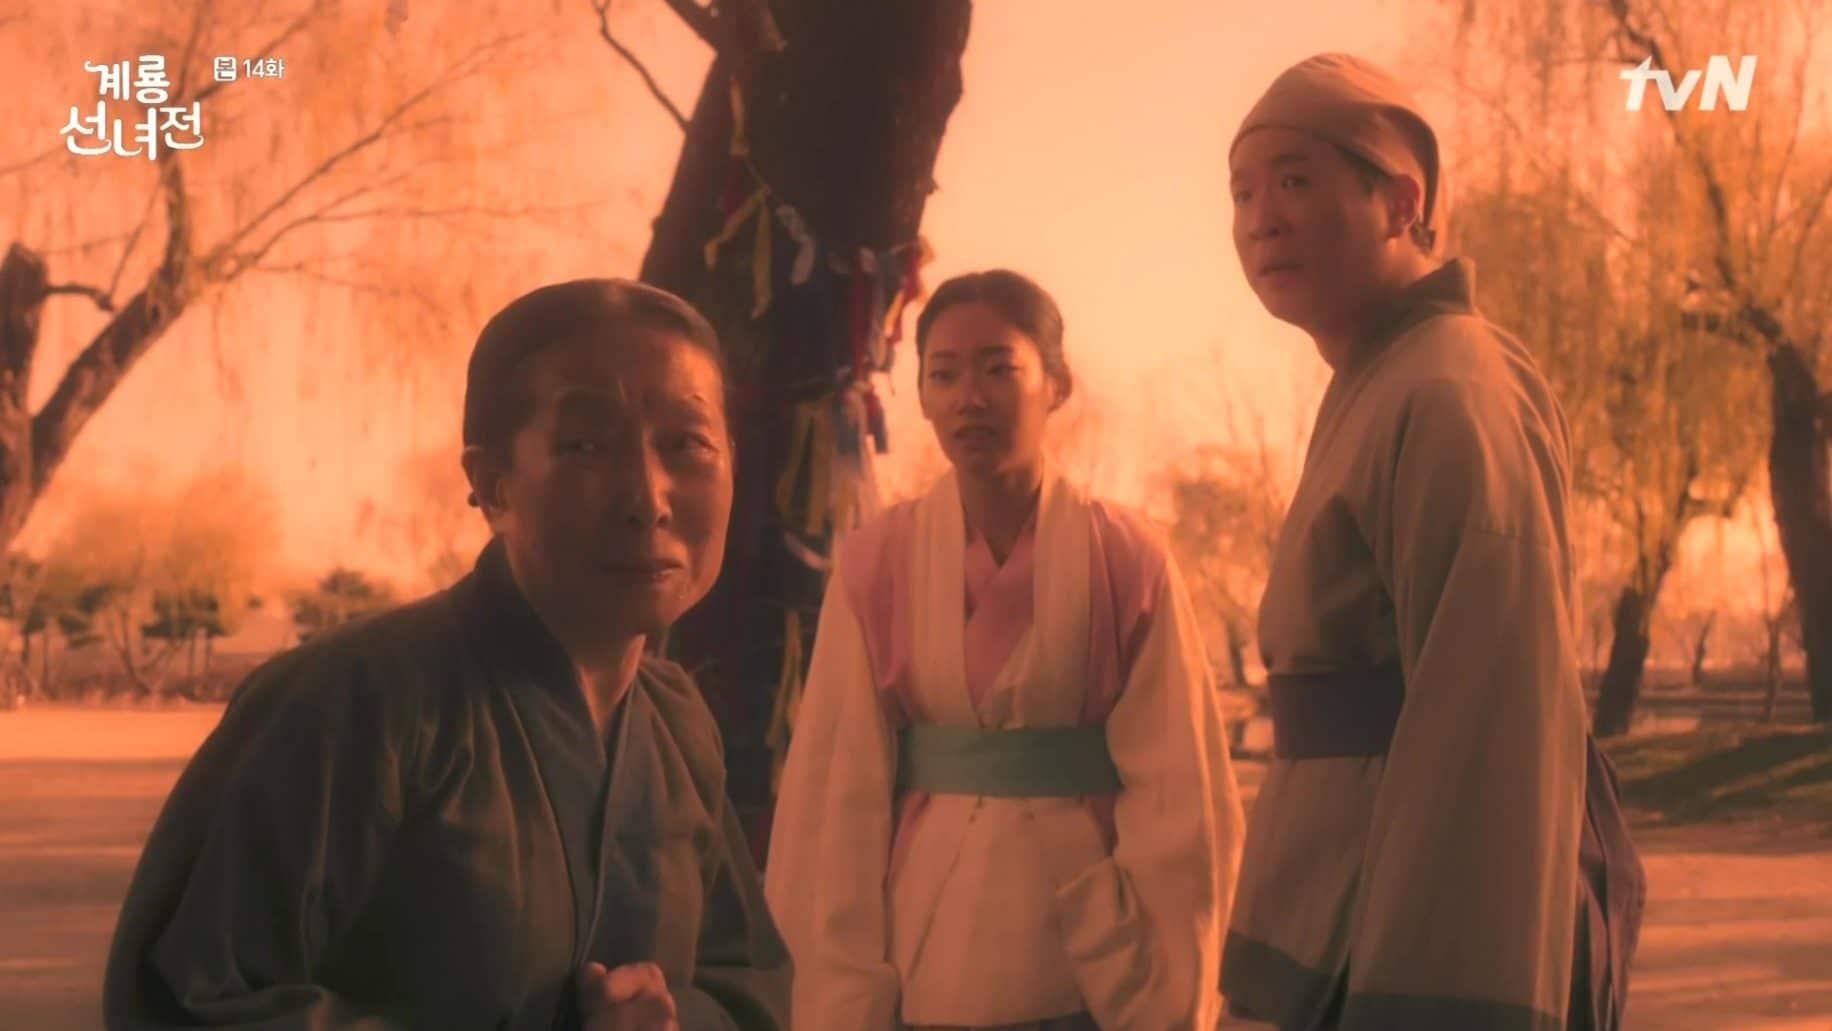 Three Villagers